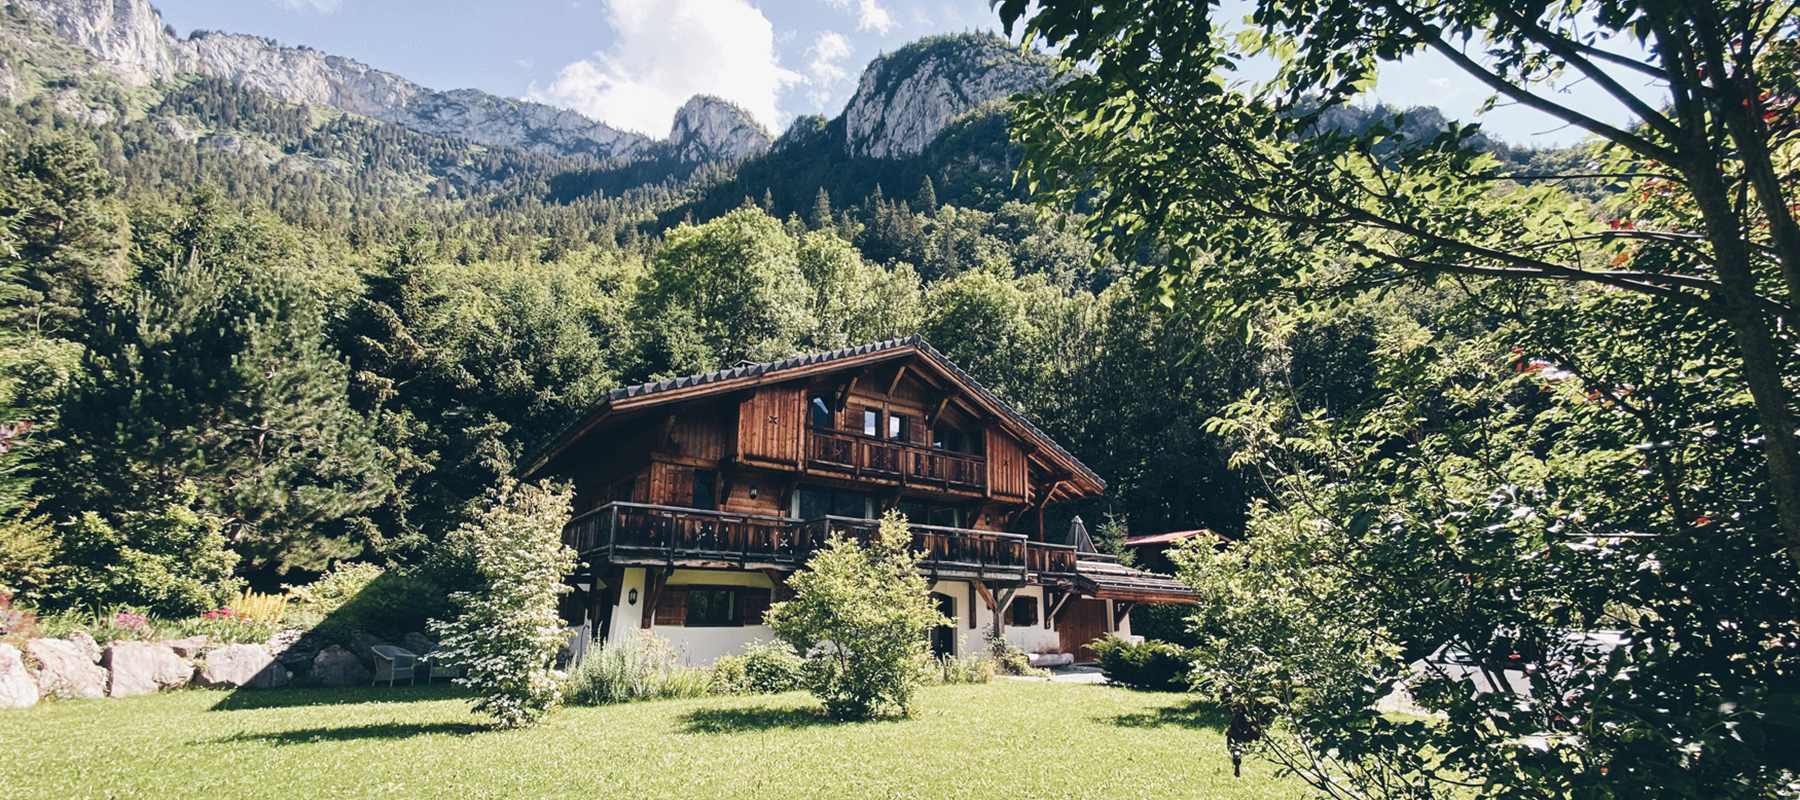 The Landscape Lodge